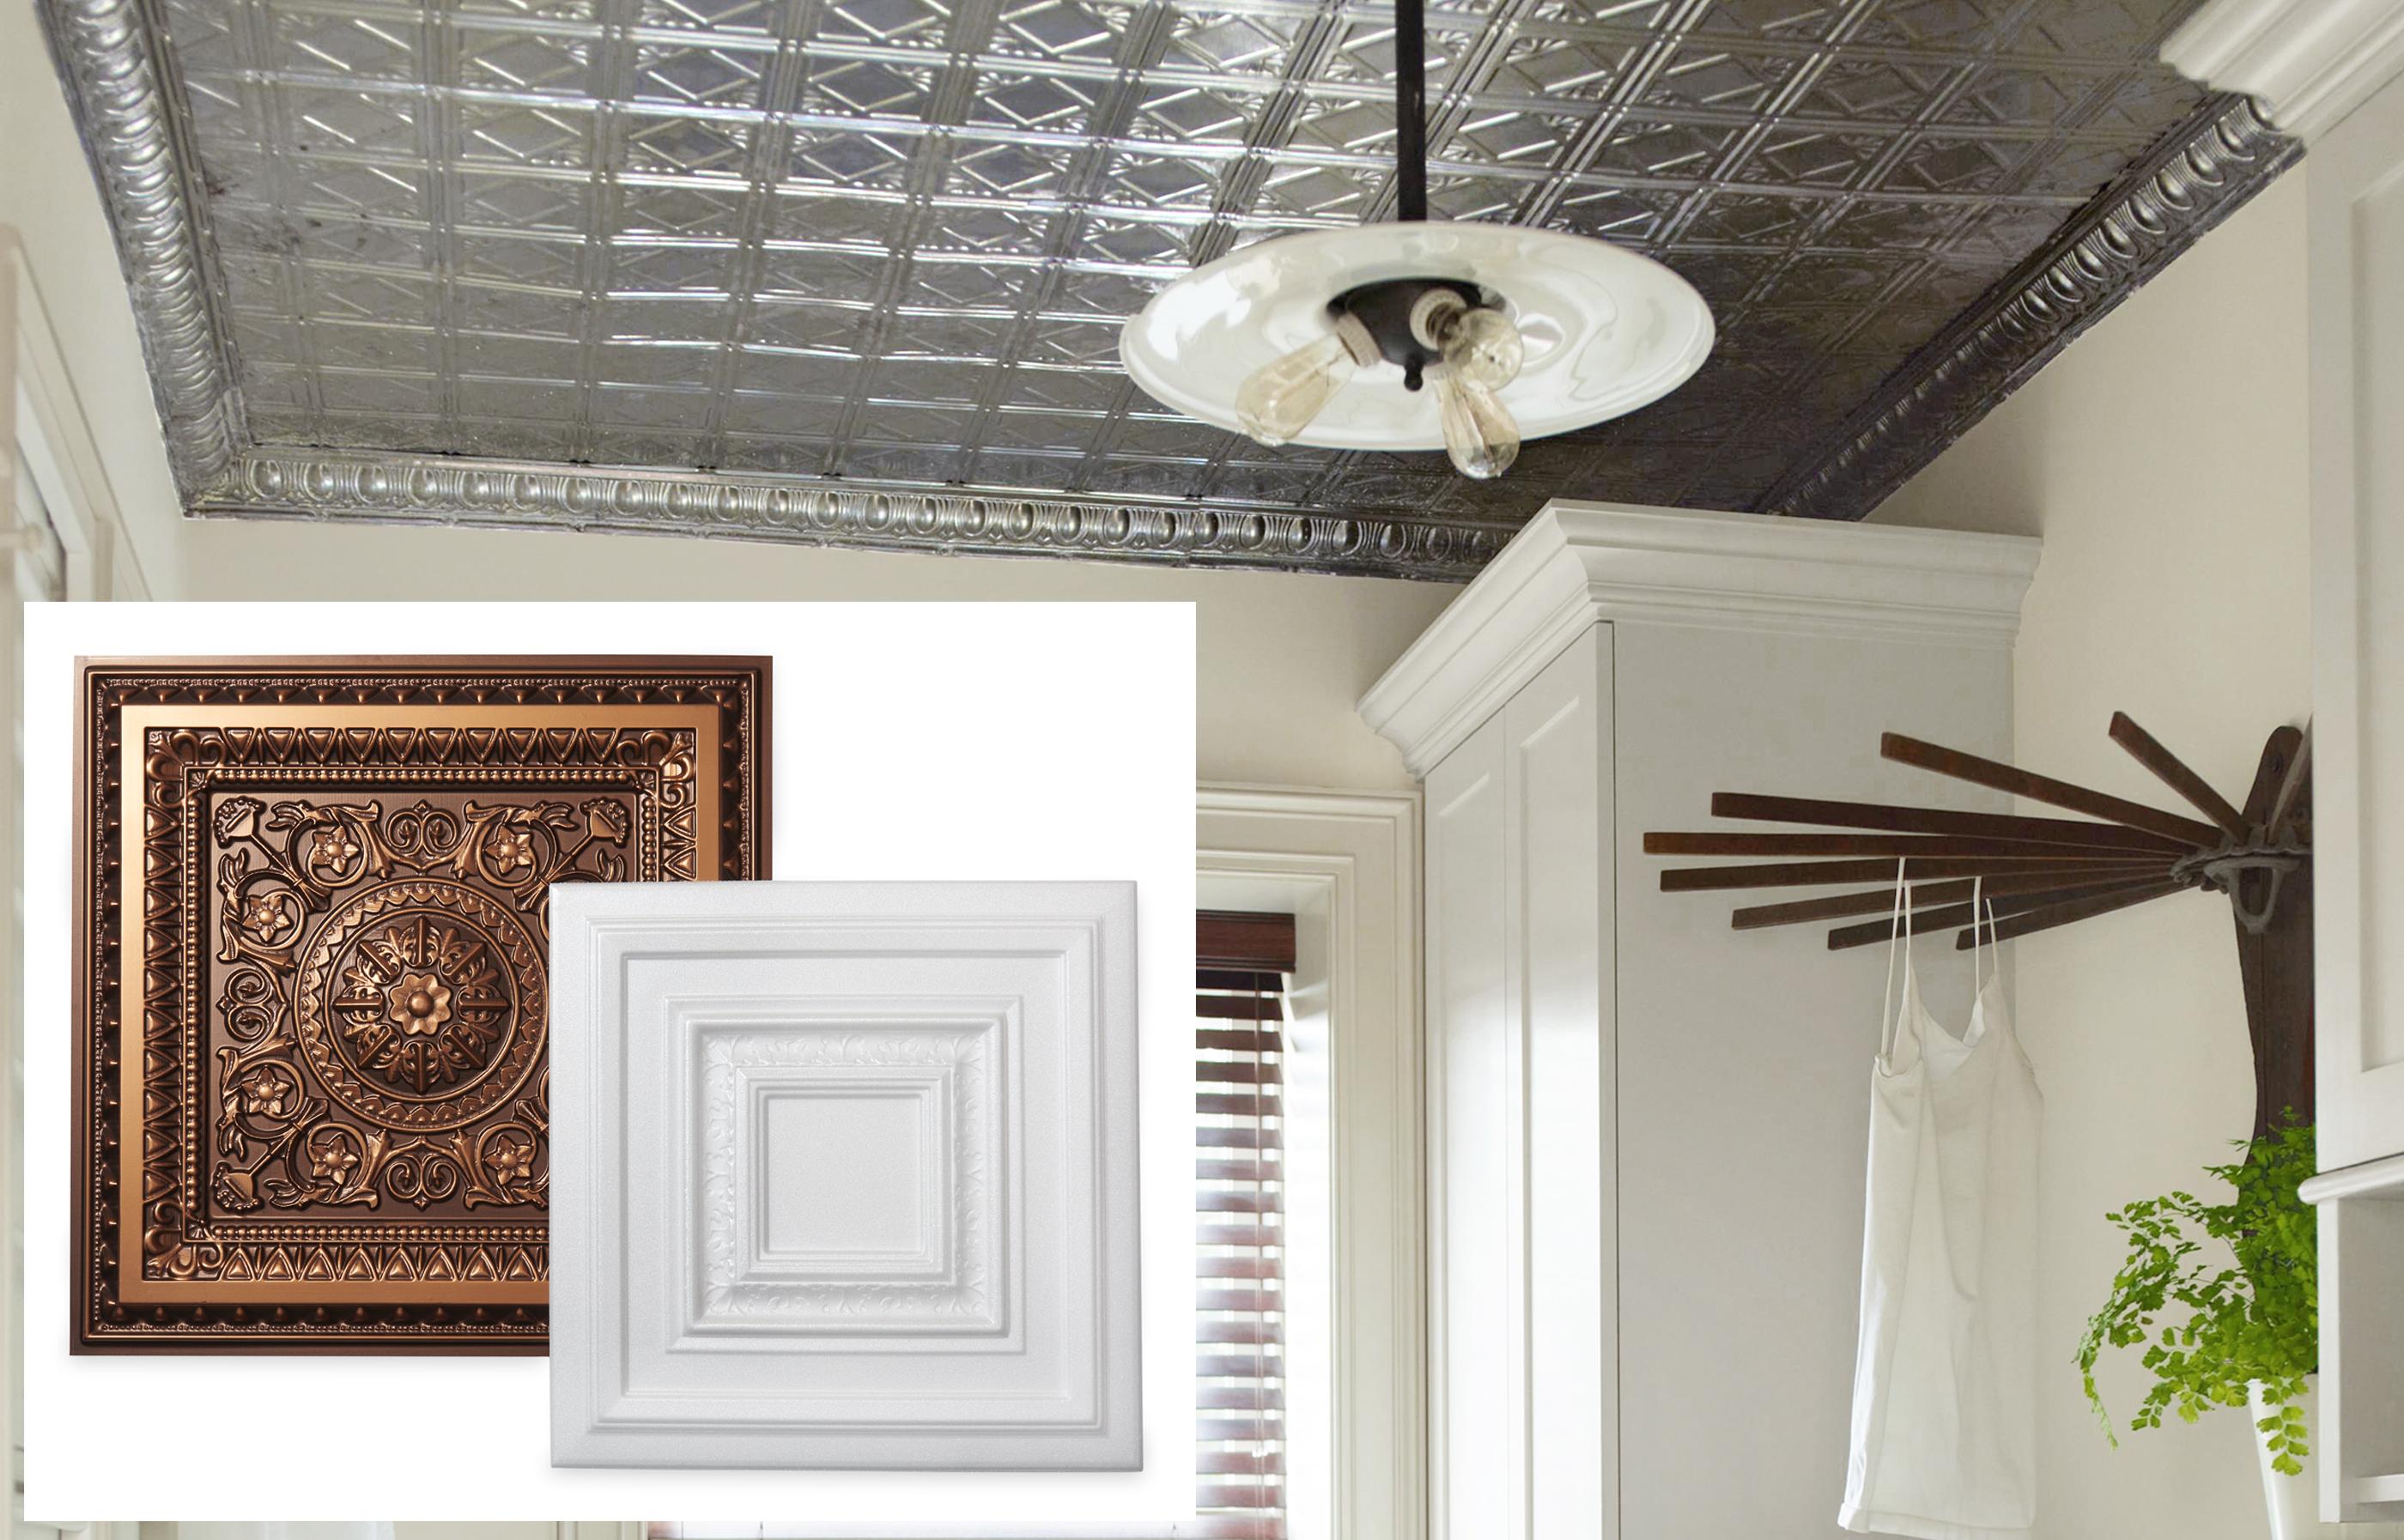 PVC Rosette Patern Ceiling Tiles By La Scala